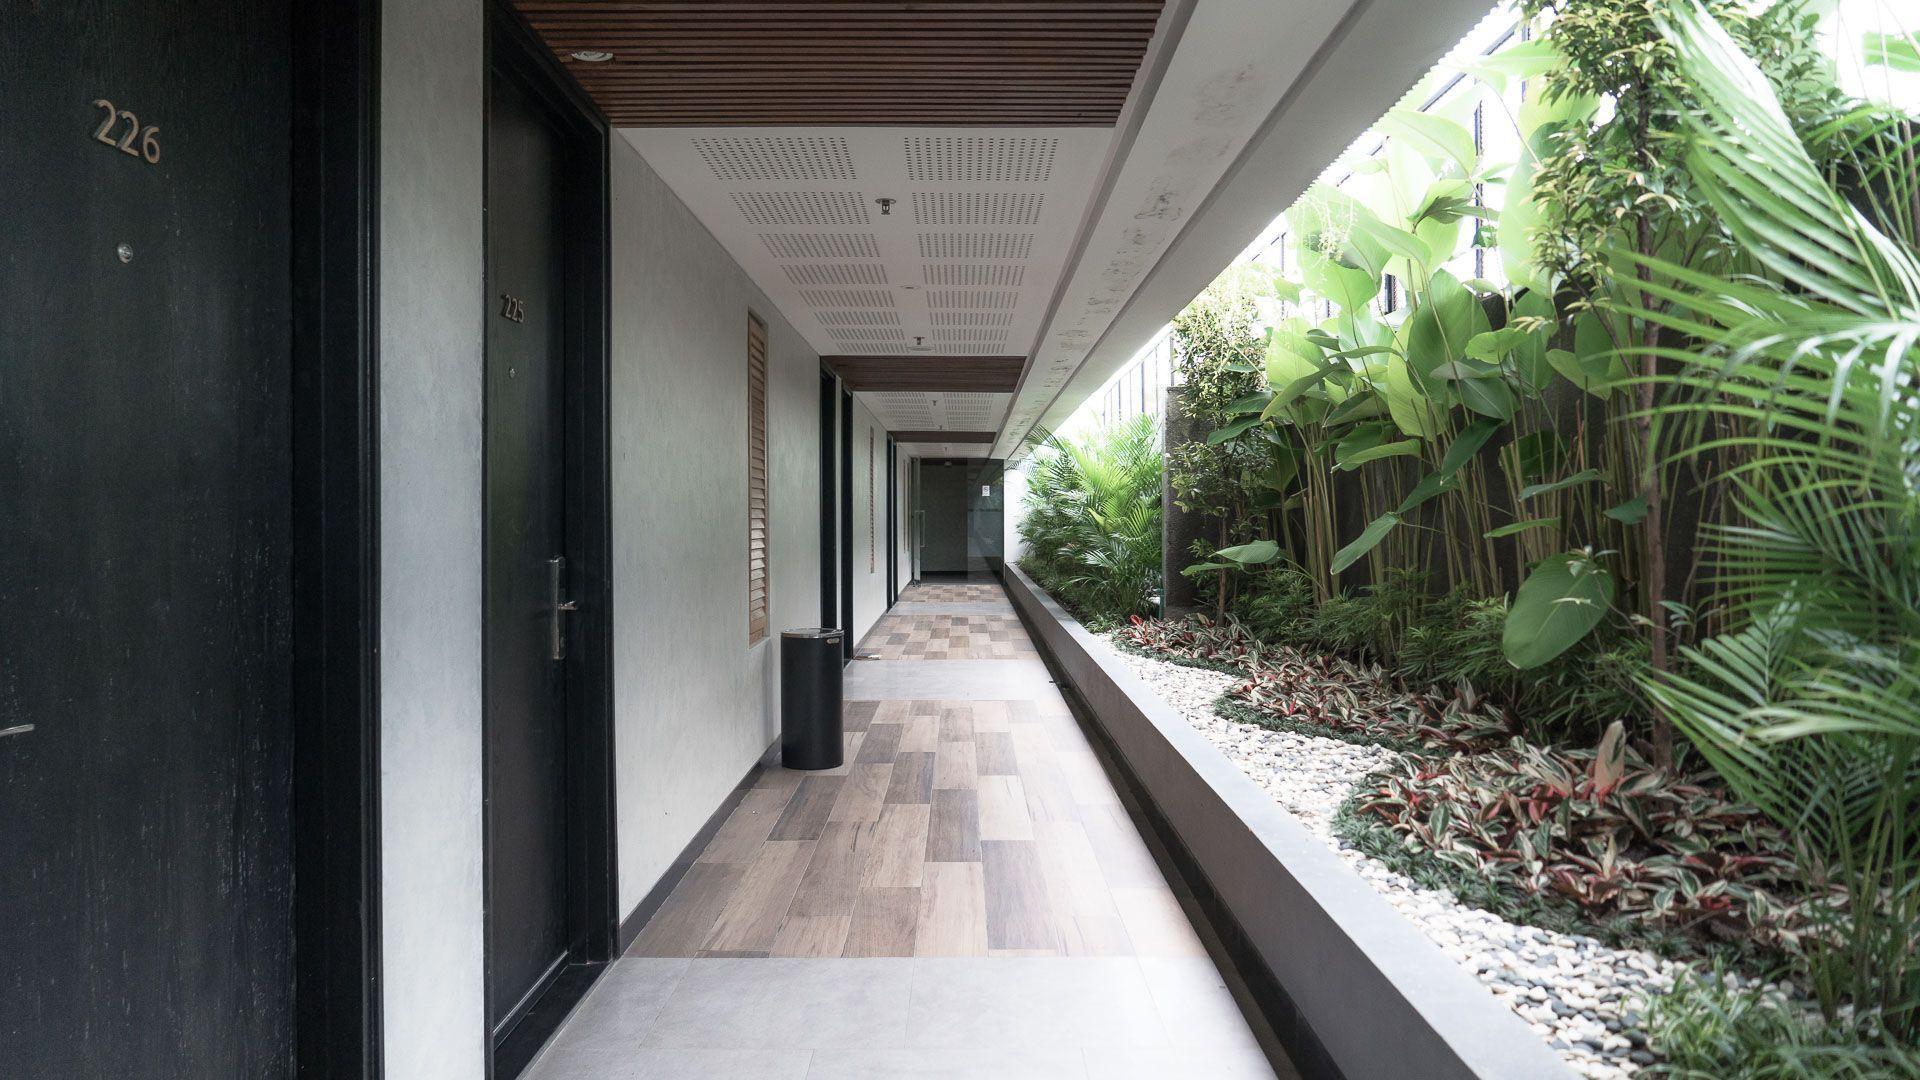 Lesvoyageuses-Indonesie-yogyacarta-gaia-cosmo-hotel-27